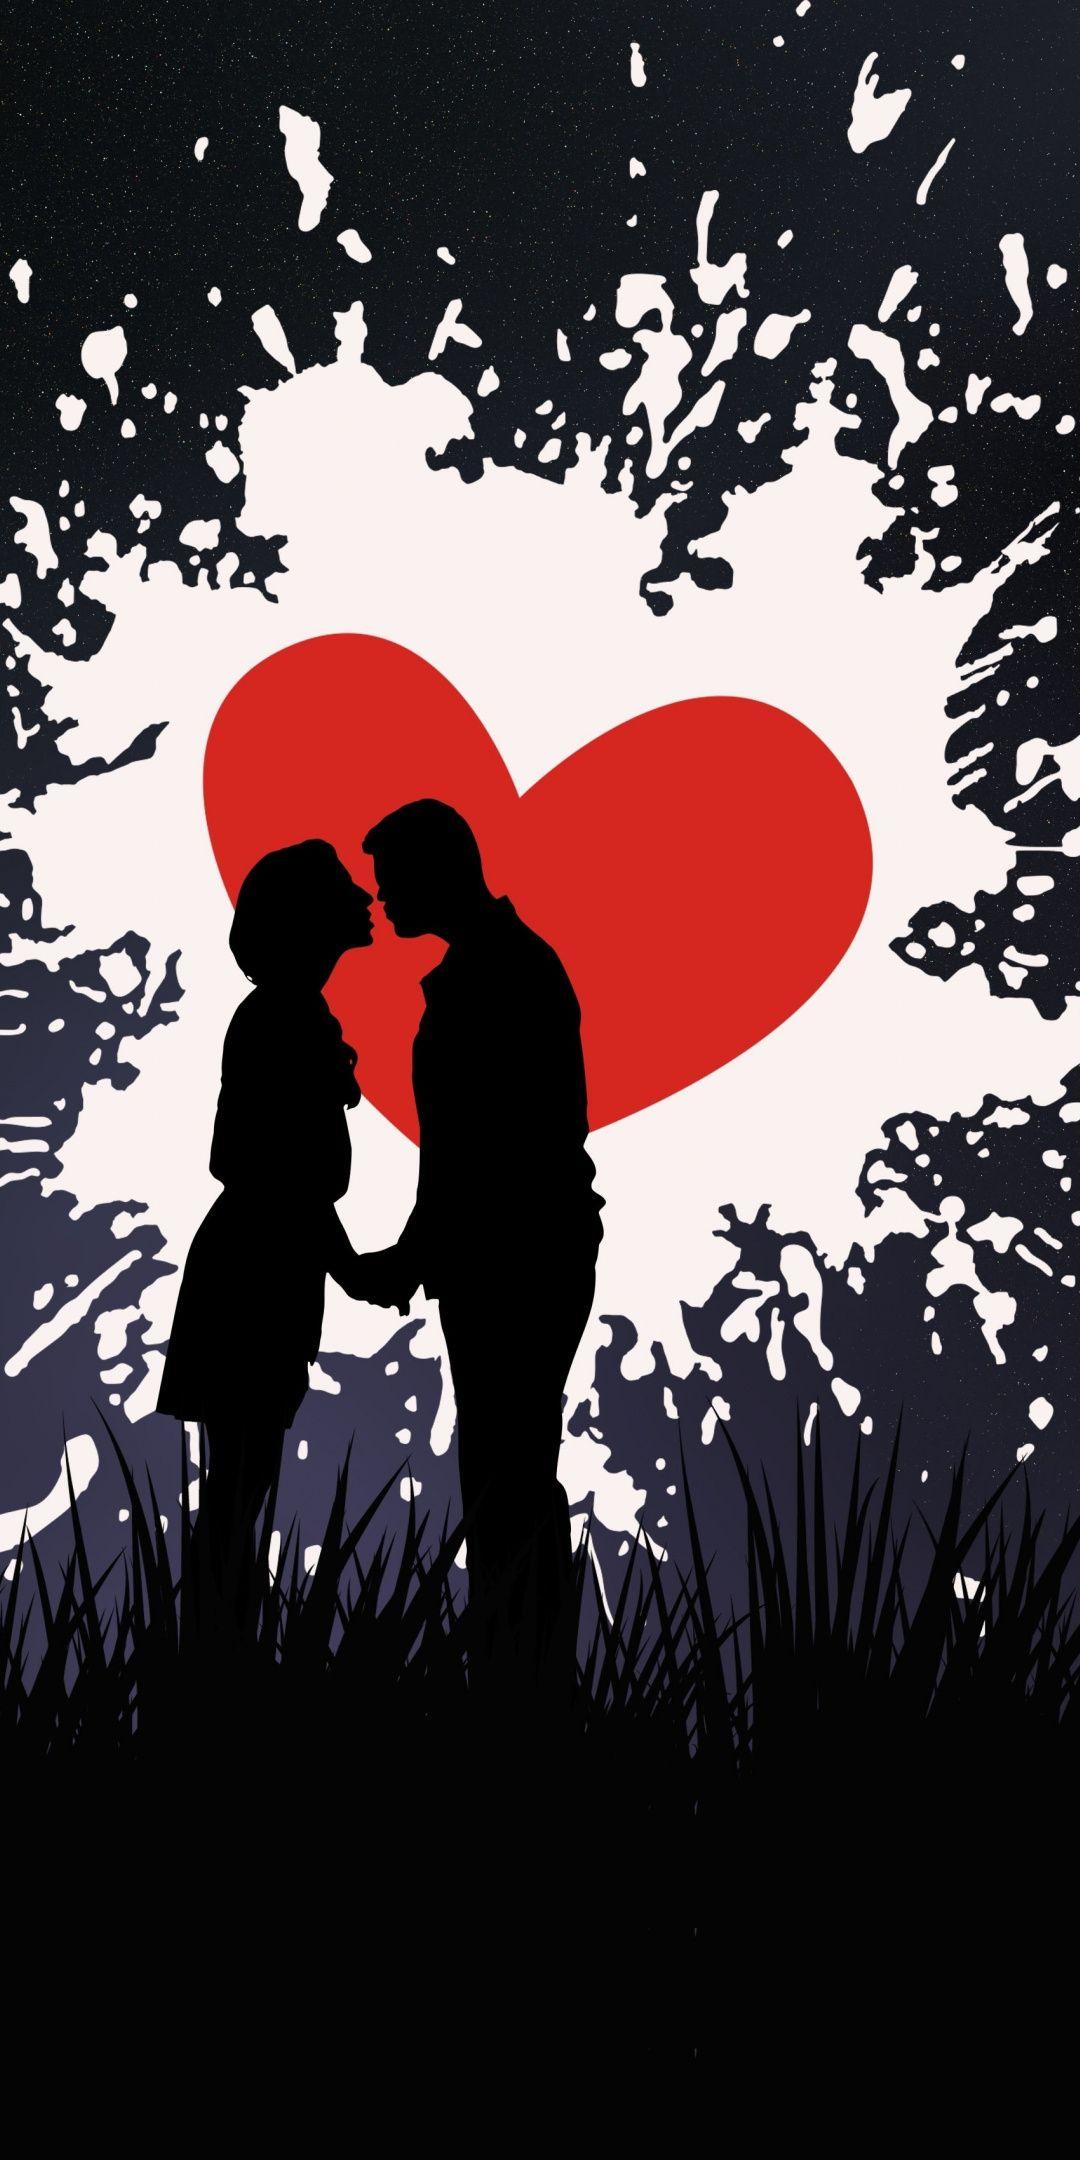 Silhouette Artwork Couple Kiss Love Wallpaper Love Wallpaper Art Wallpaper Artwork